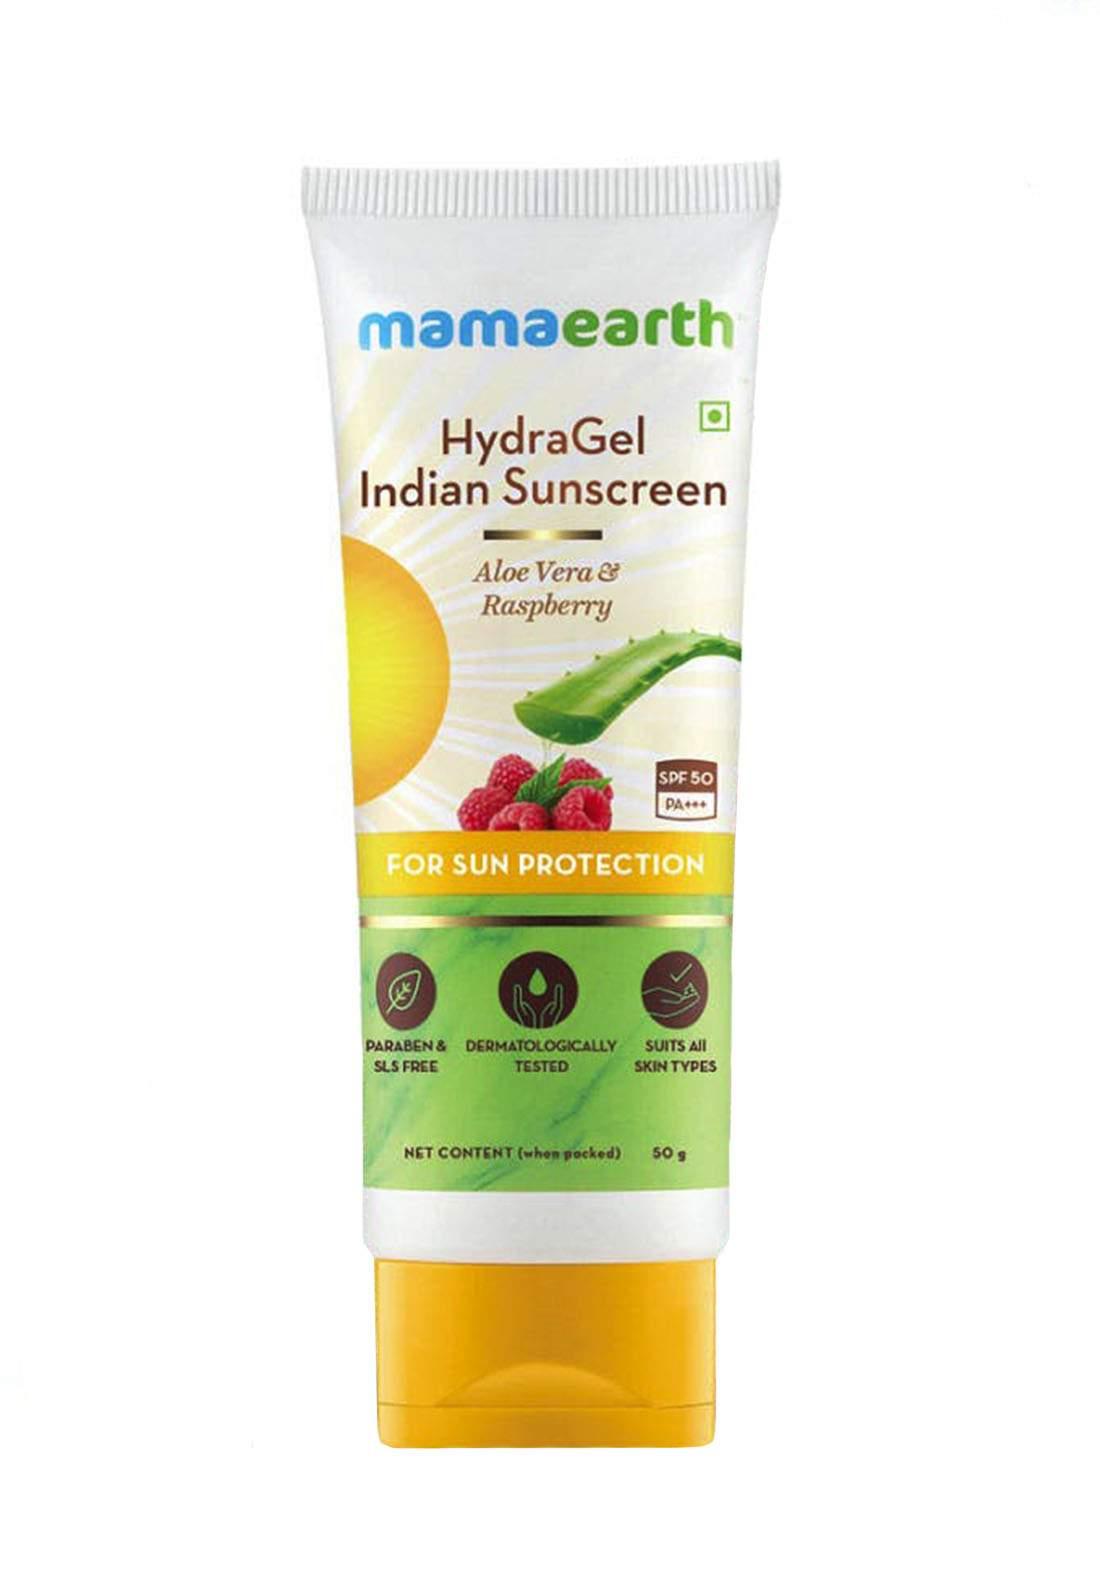 Mamaearth Hydragel Indian Sunscreen SPF 50 50g جل واقي الشمس